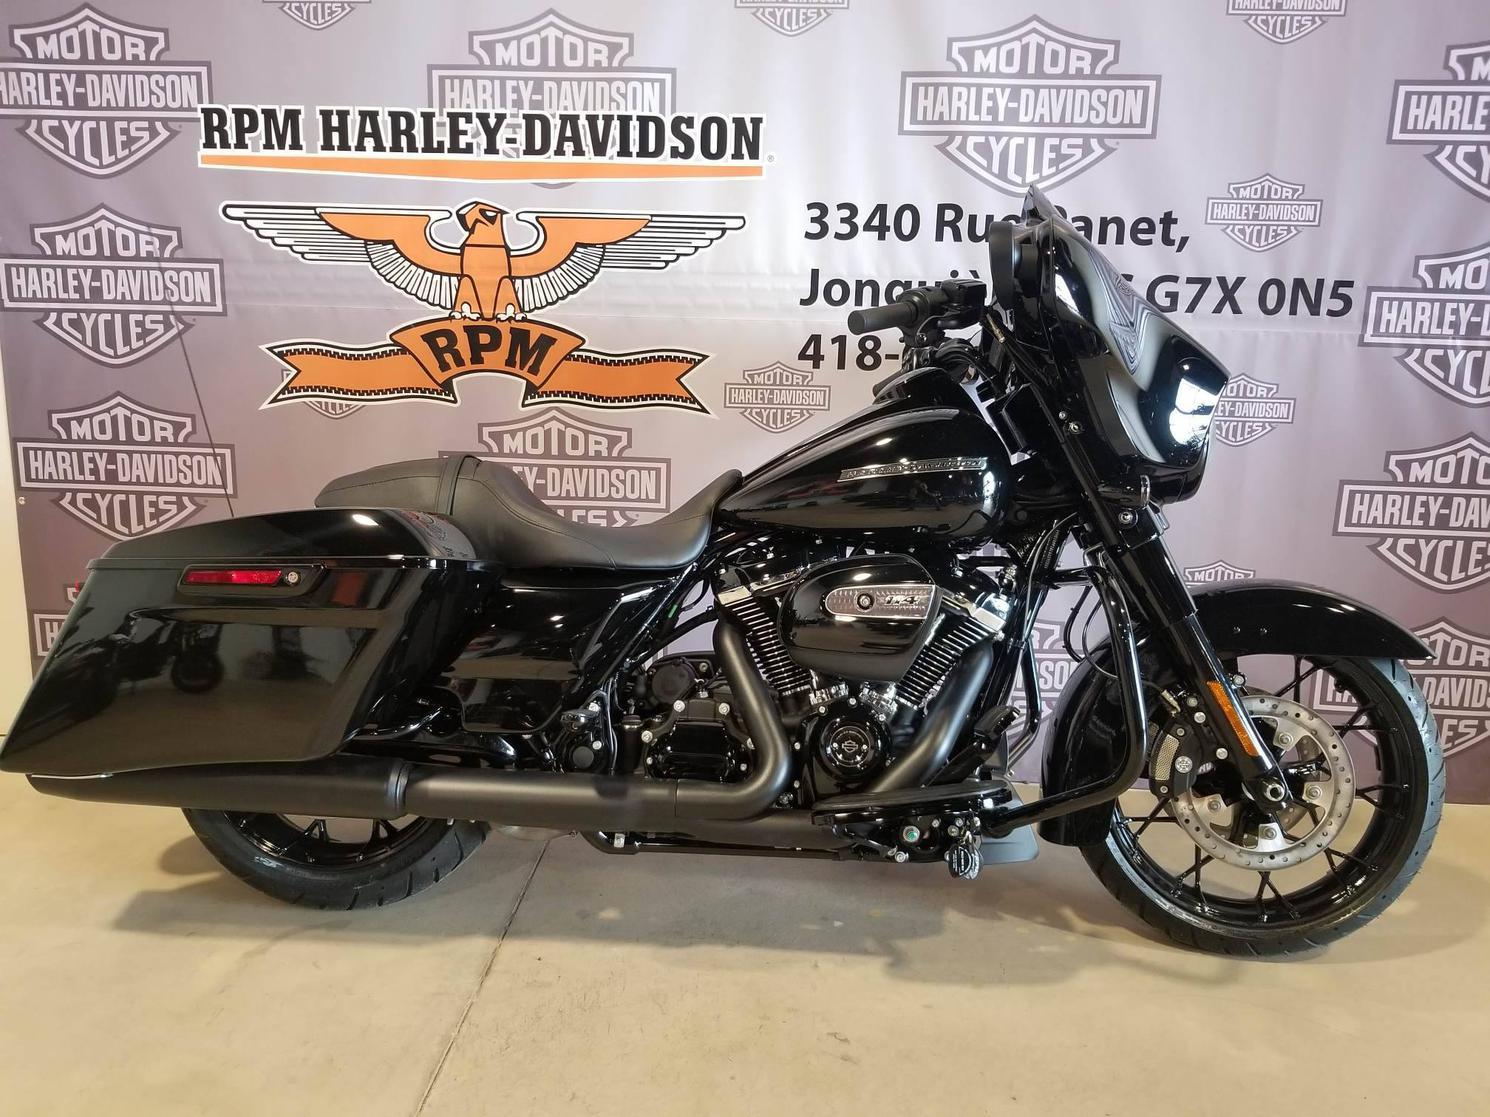 Harley-Davidson Street Glide Special 2020 - FLHXS